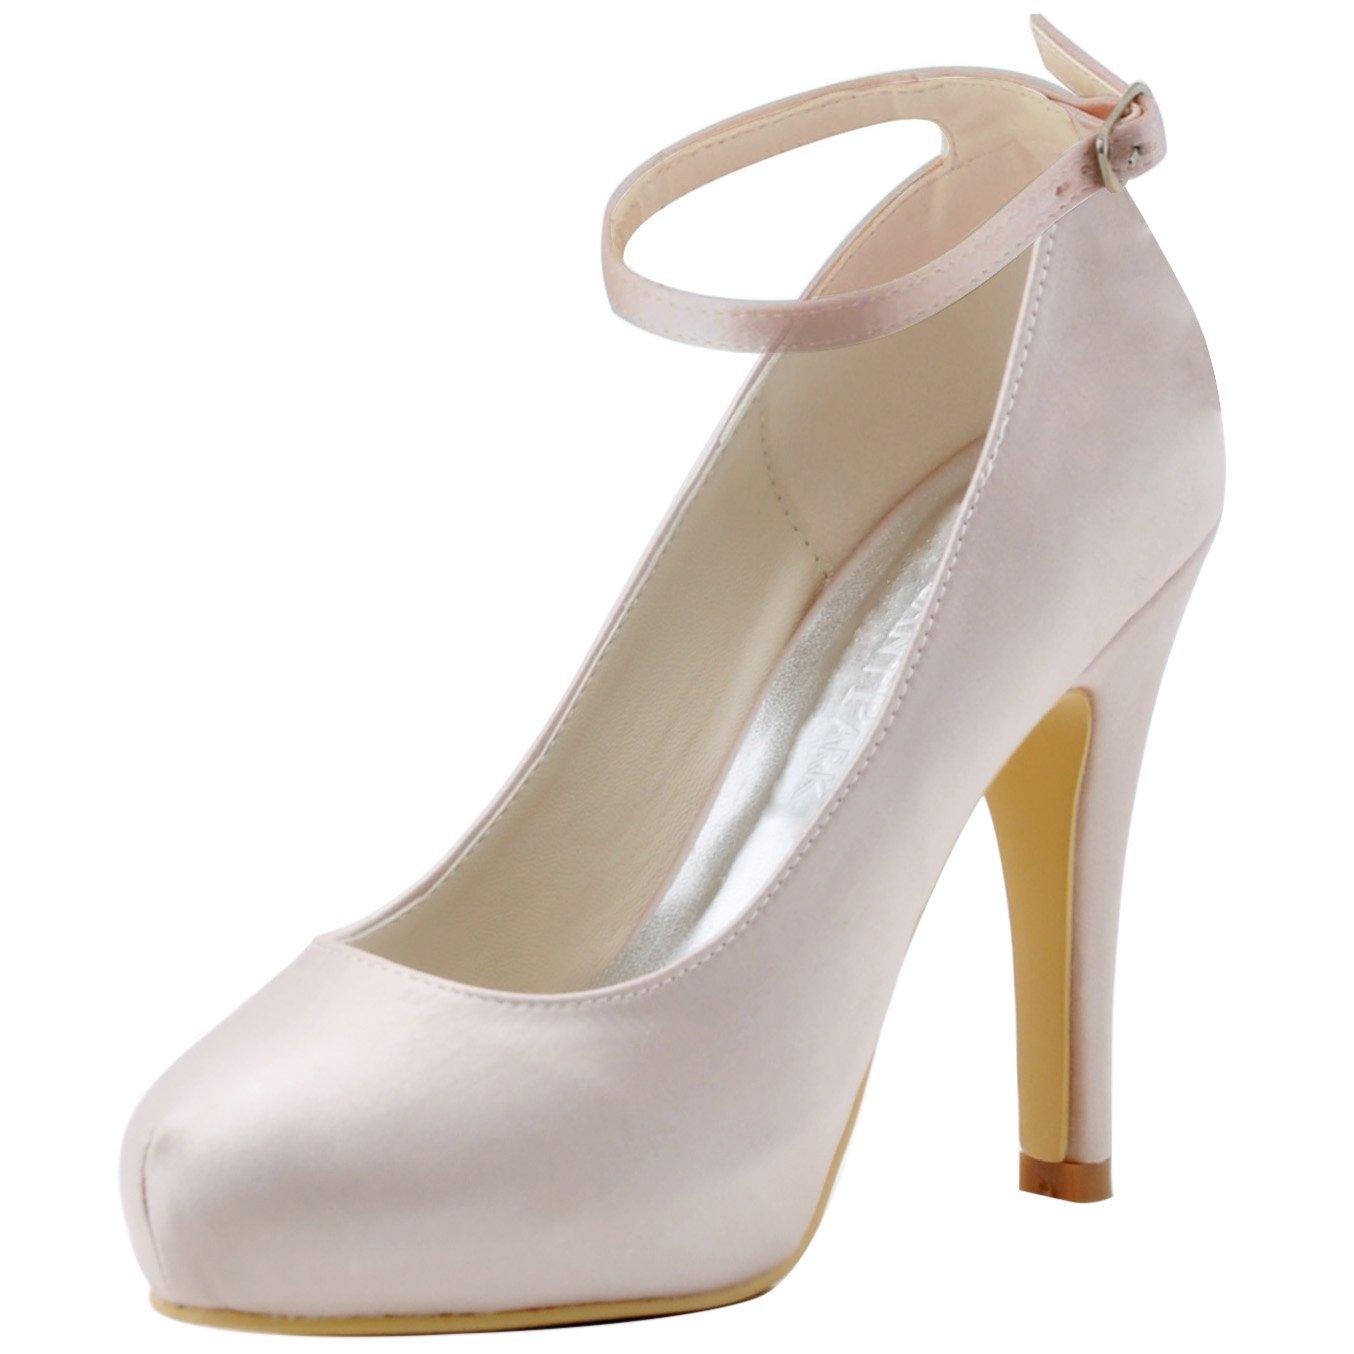 ElegantPark Women Pumps Closed Toe High Heel Platform Ankle Straps Evening Wedding Shoes B013UARUEK 9 B(M) US|Beige